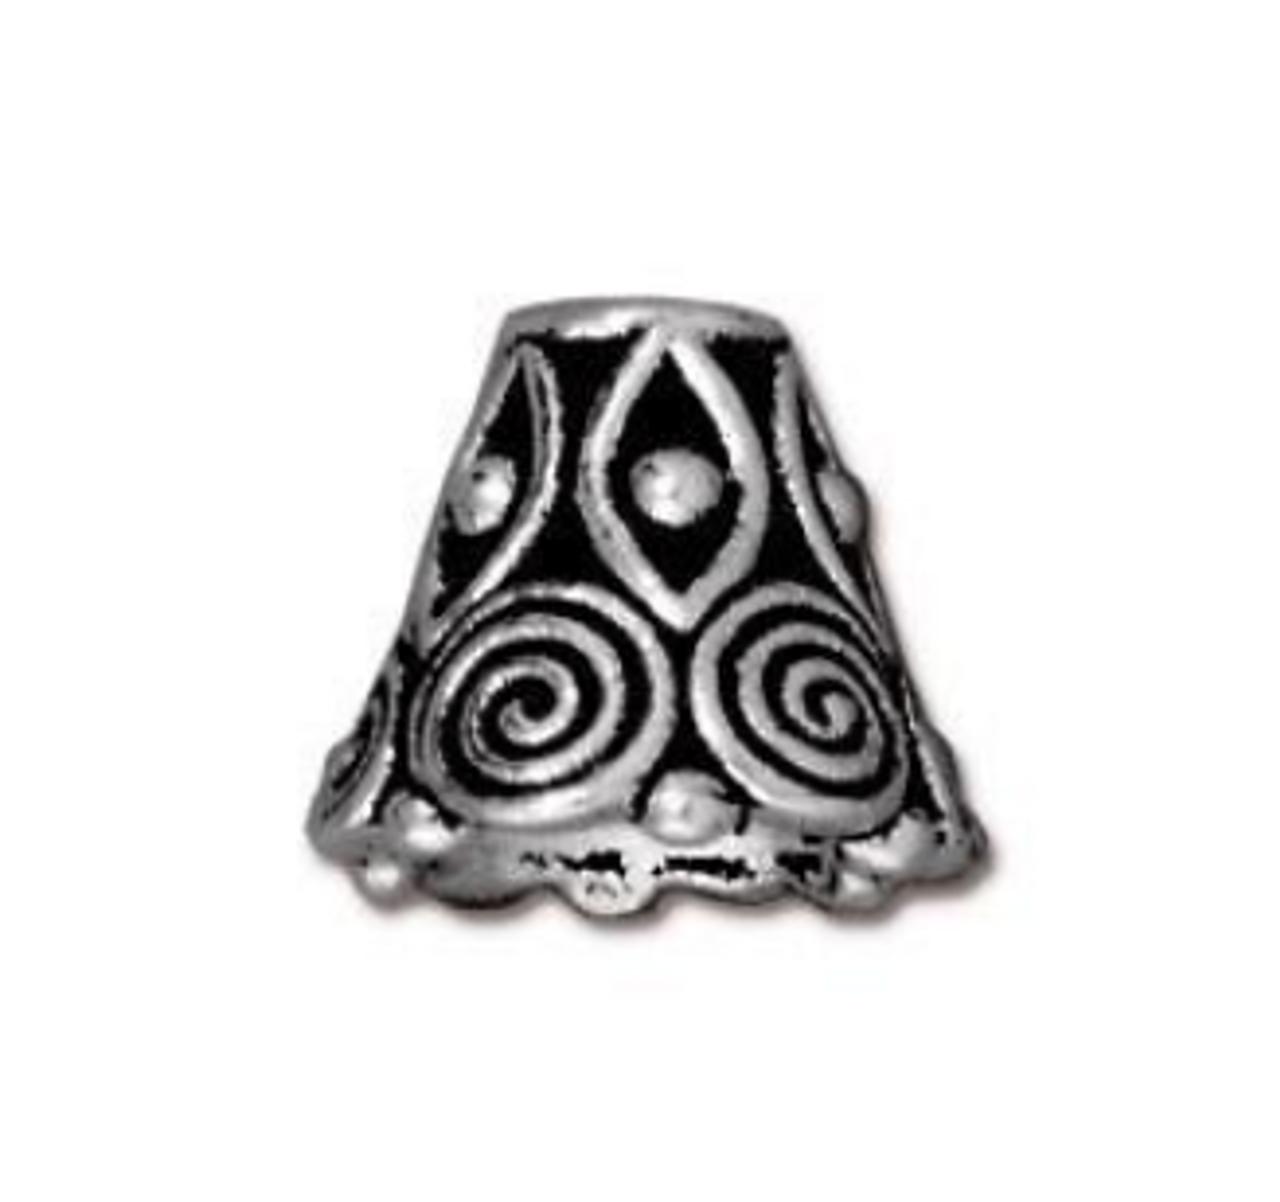 Antique Silver Spiral Bead Cone (2pk) TierraCast